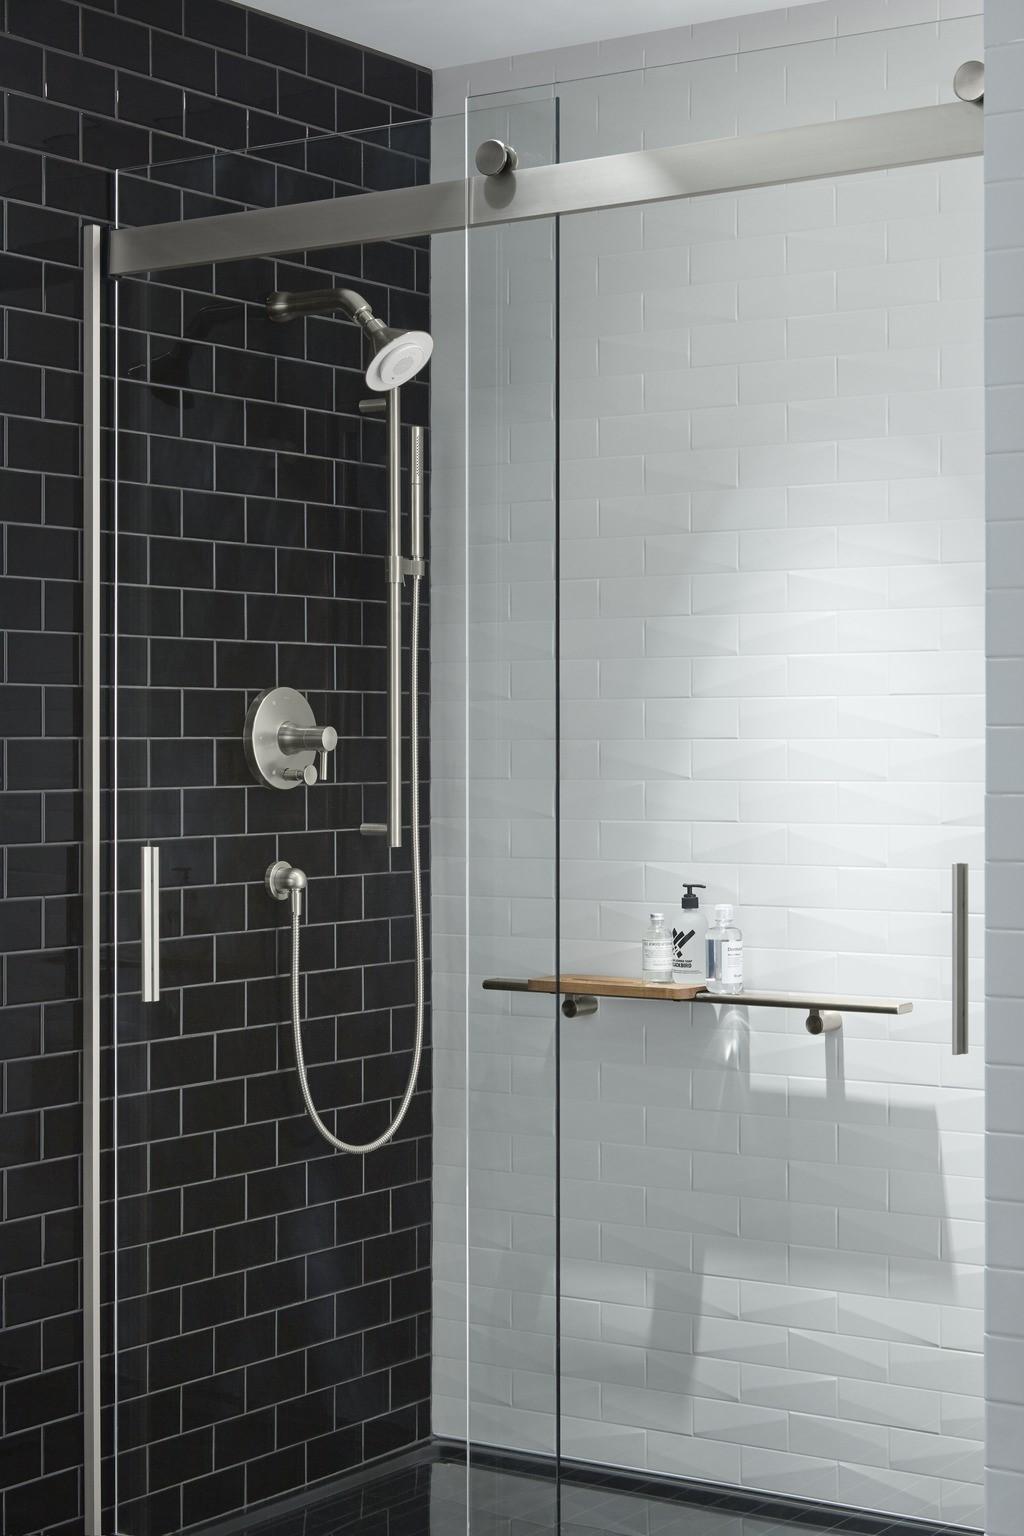 St Louis Bathroom Remodeling 100 Financing Alenco